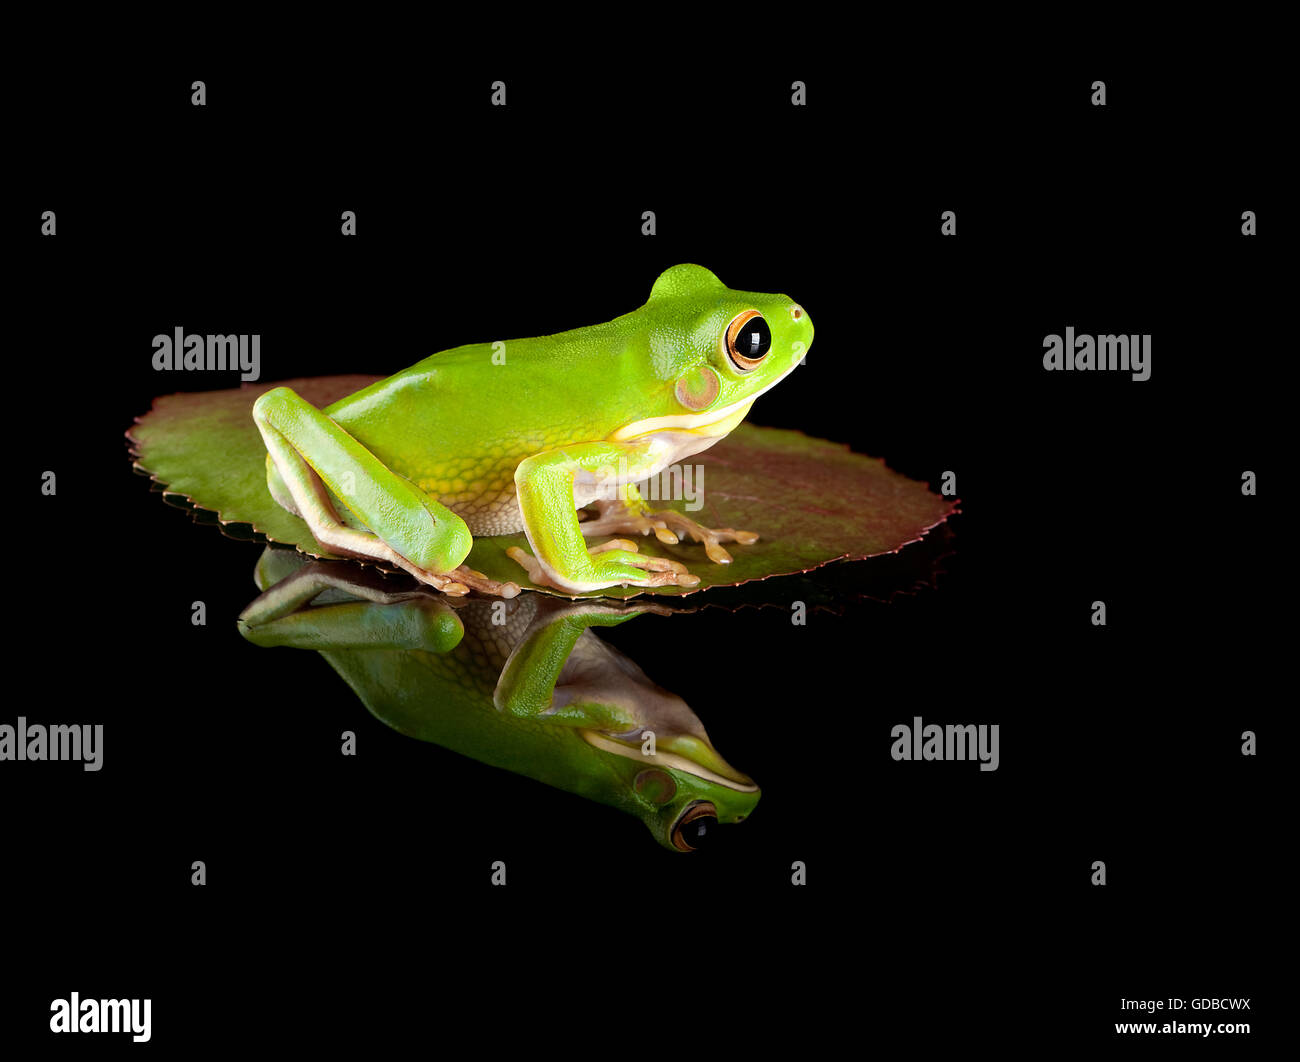 White-lipped tree frog or Litoria Infrafrenata sitting on a leaf - Stock Image